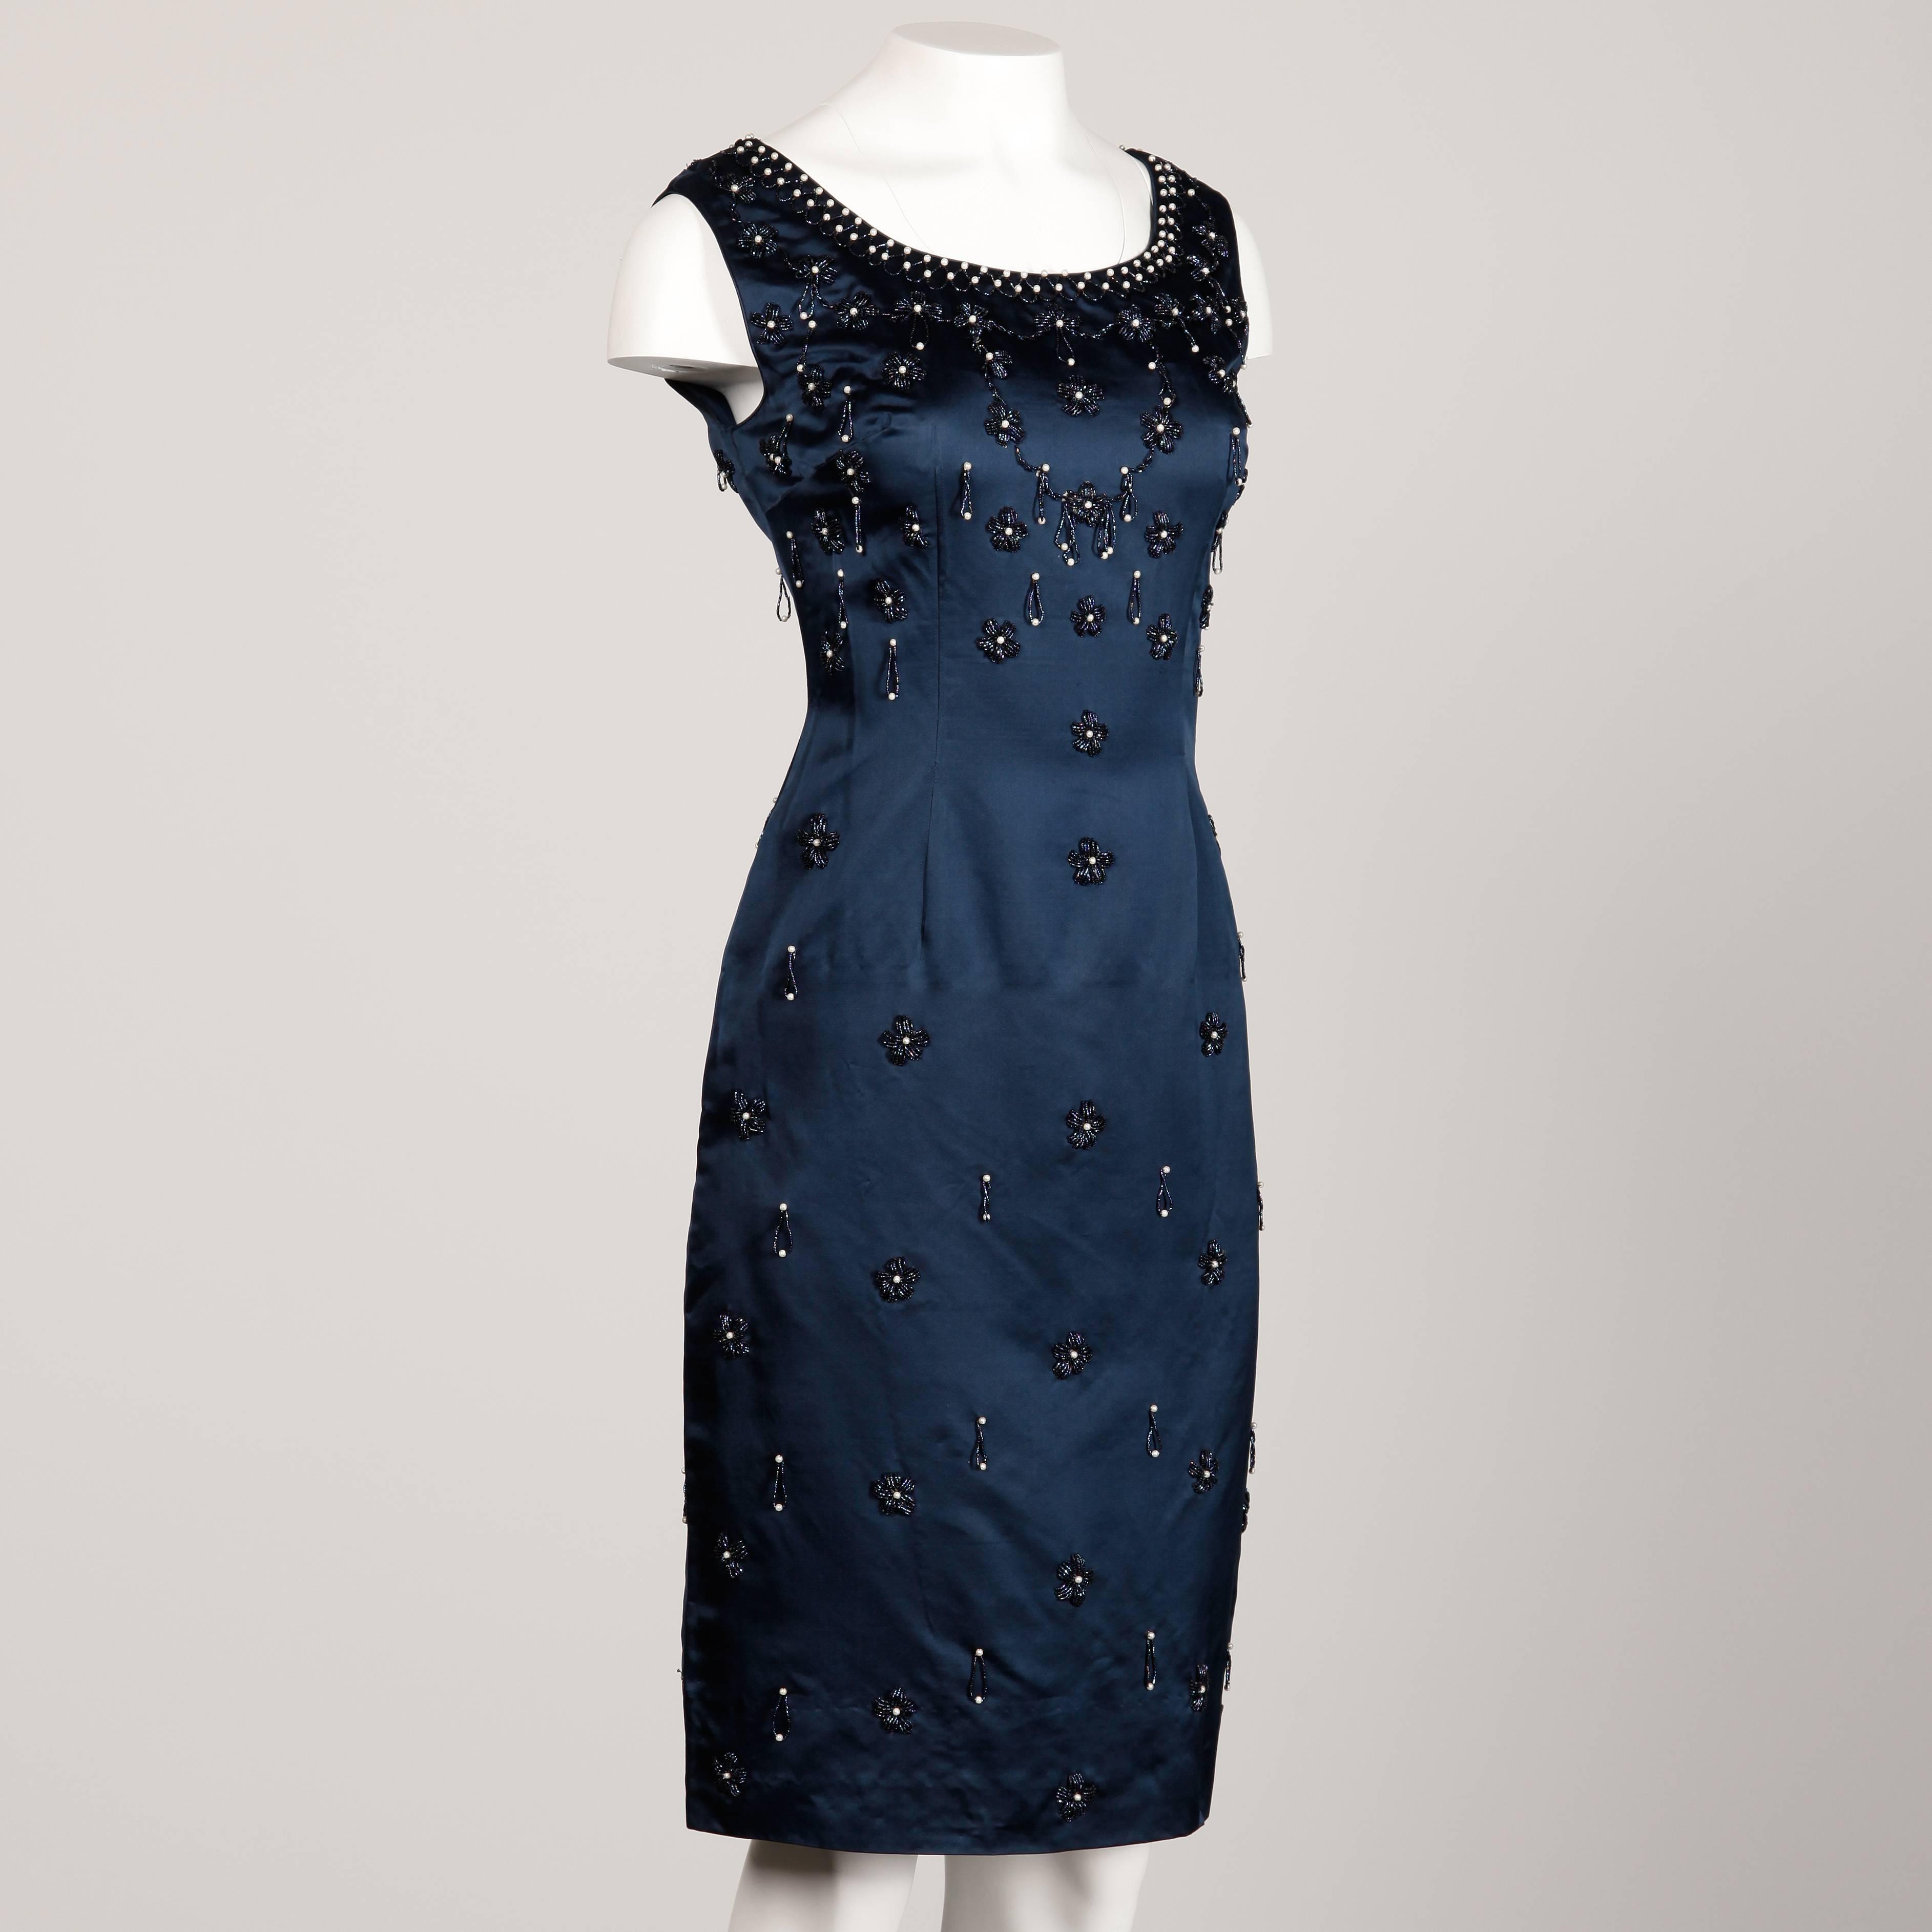 Satin Beaded Dress